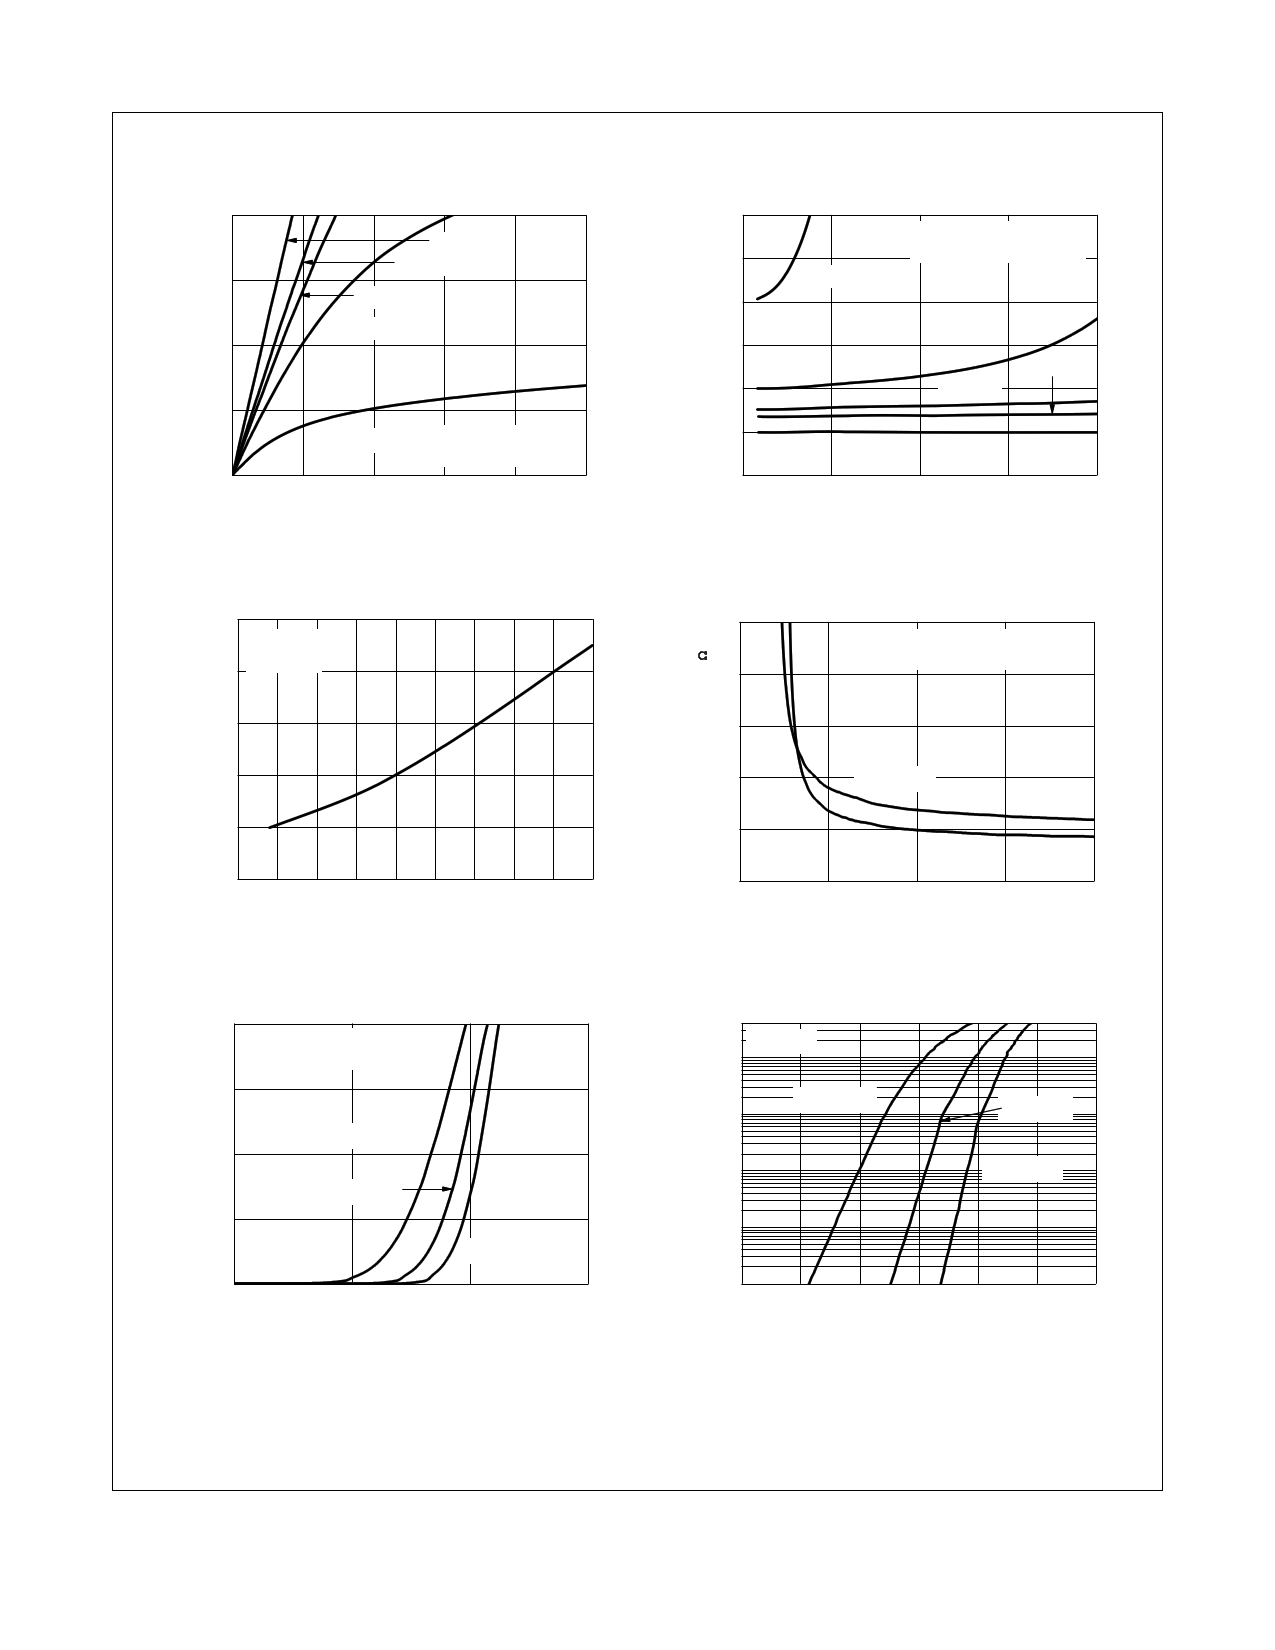 FDMS3600S pdf, 반도체, 판매, 대치품